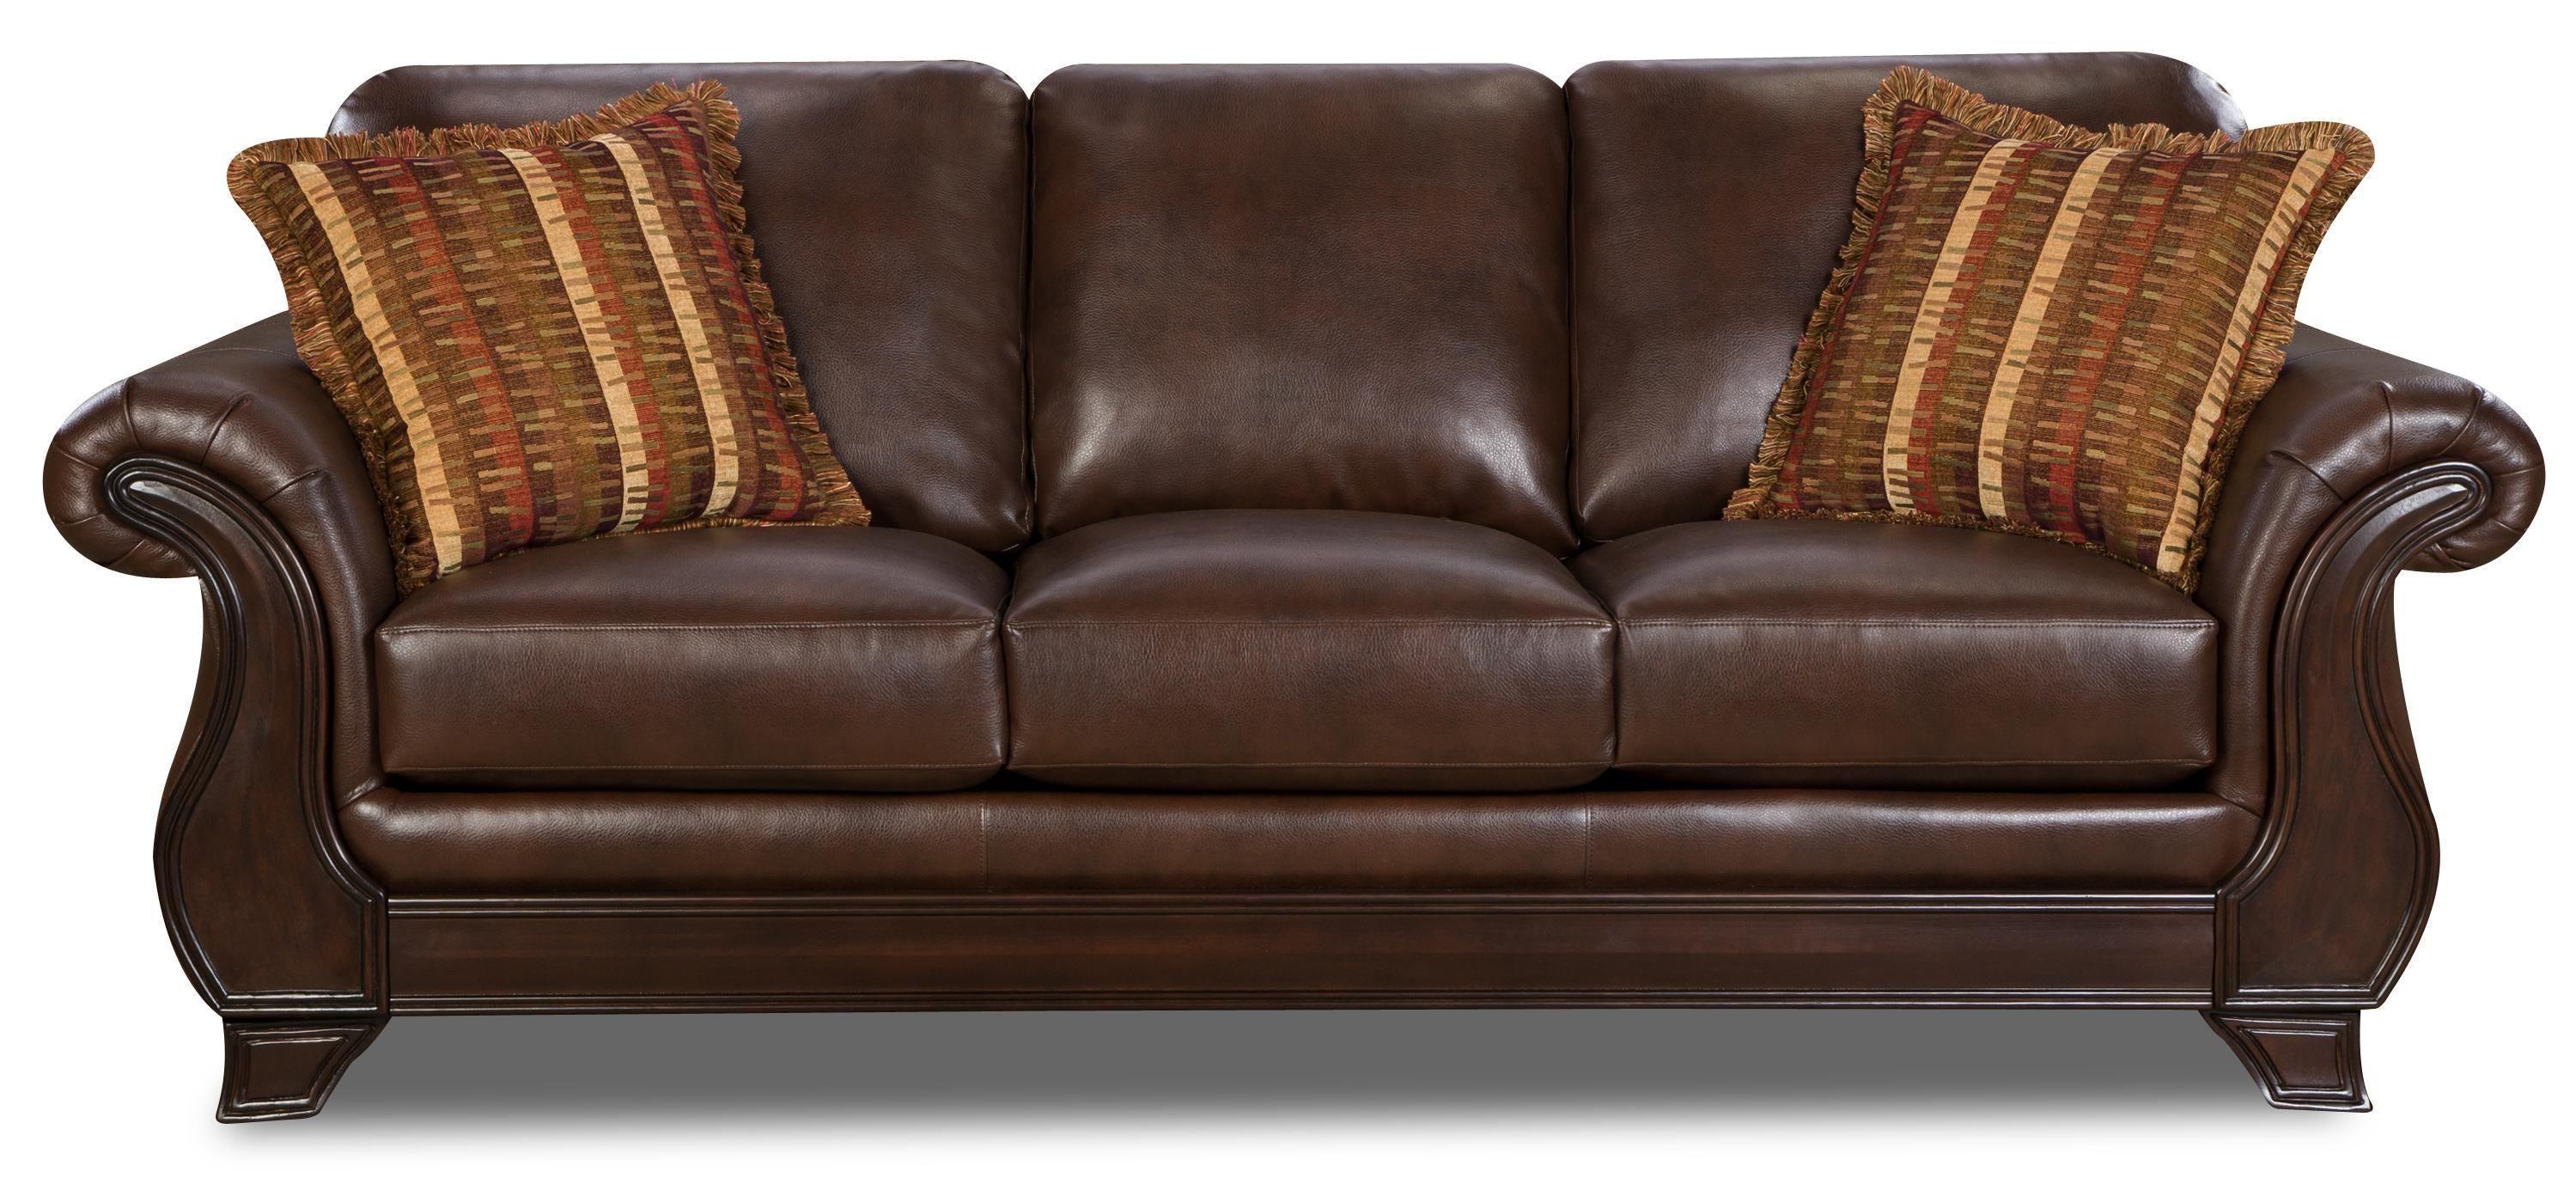 8500 Rio Grande Sofa By Corinthian Mandy S Dream House